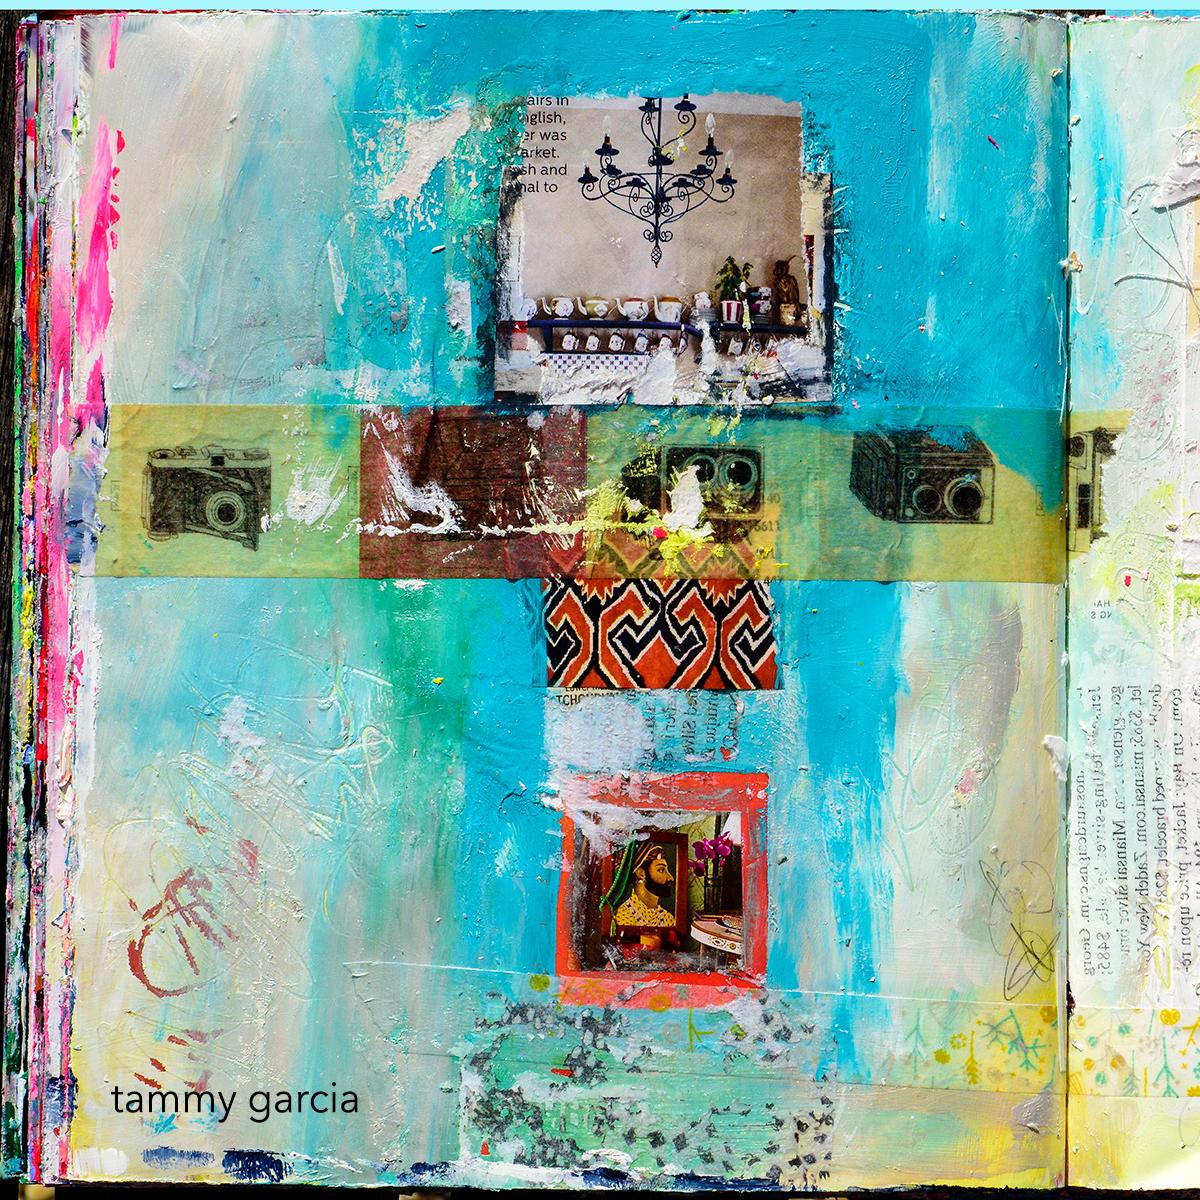 Art journal page by Tammy Garcia https://daisyyellowart.com #alteredbook #artjournal